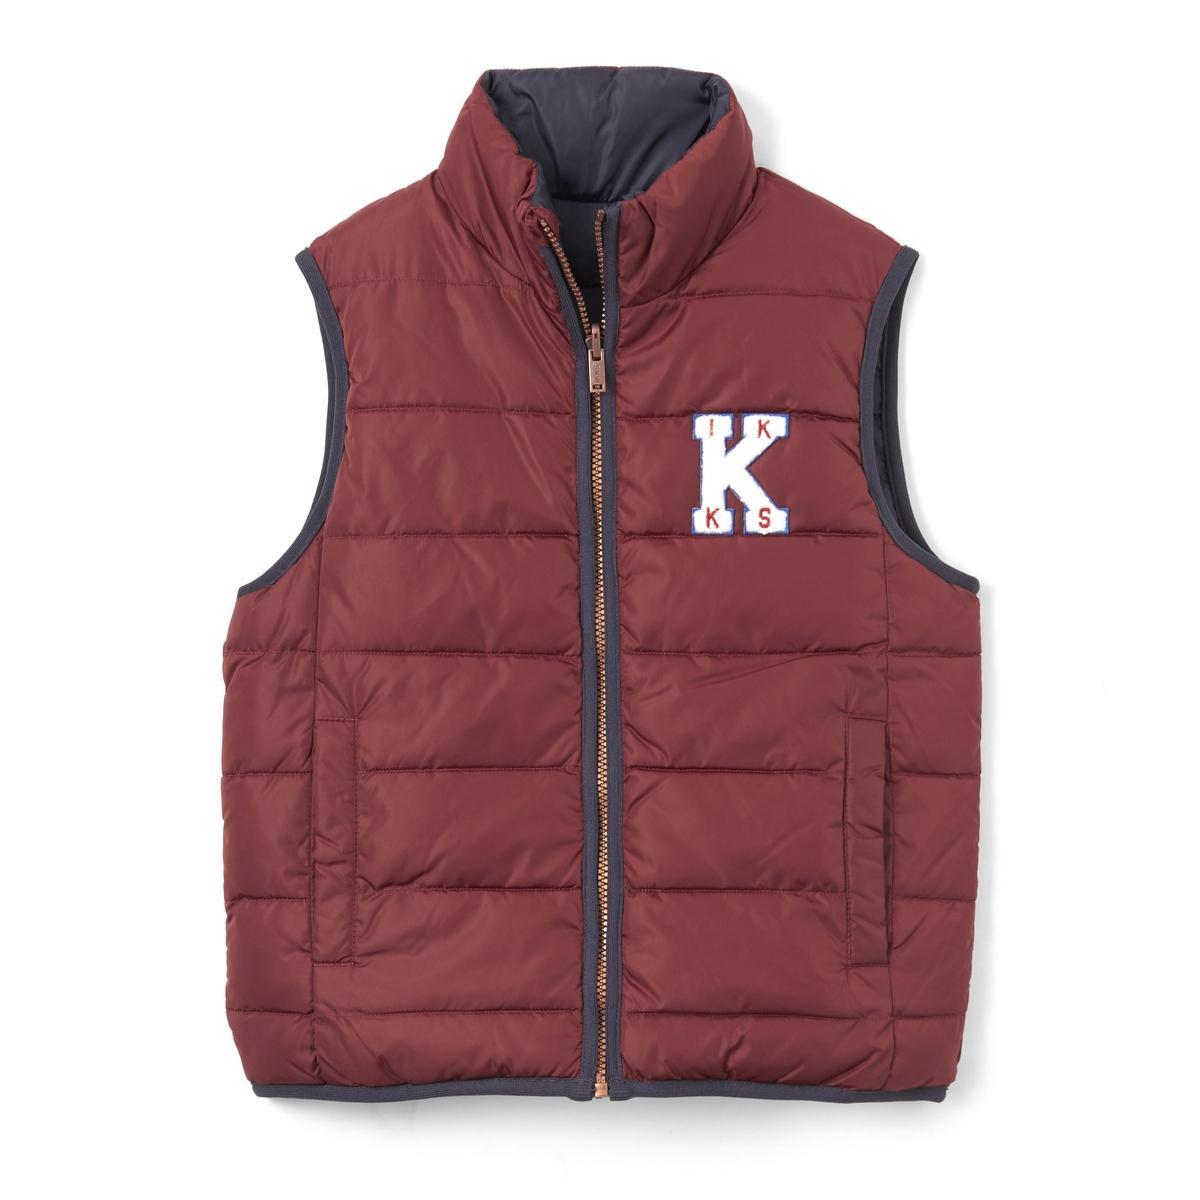 Куртка двусторонняя без рукавов, 3 - 14 лет от IKKS JUNIOR